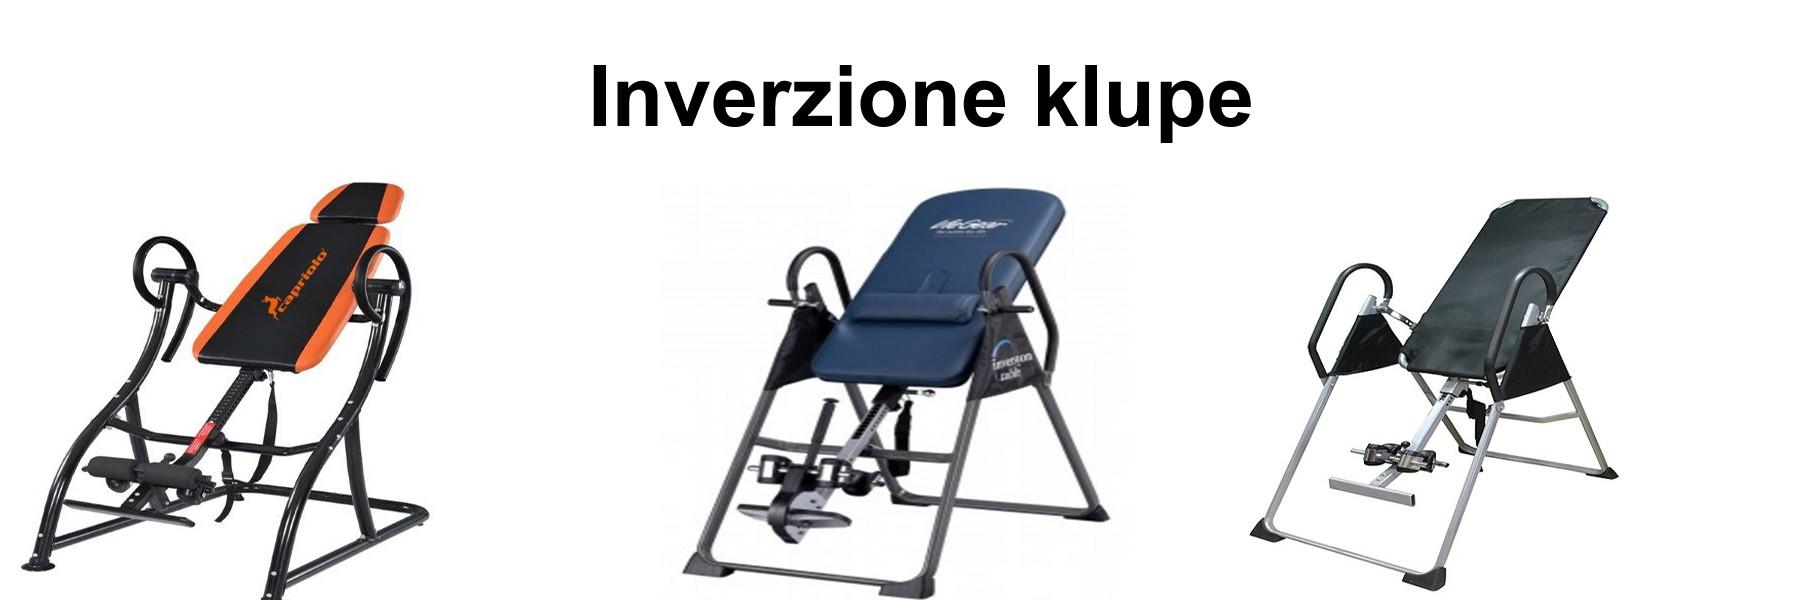 Inverzione klupe